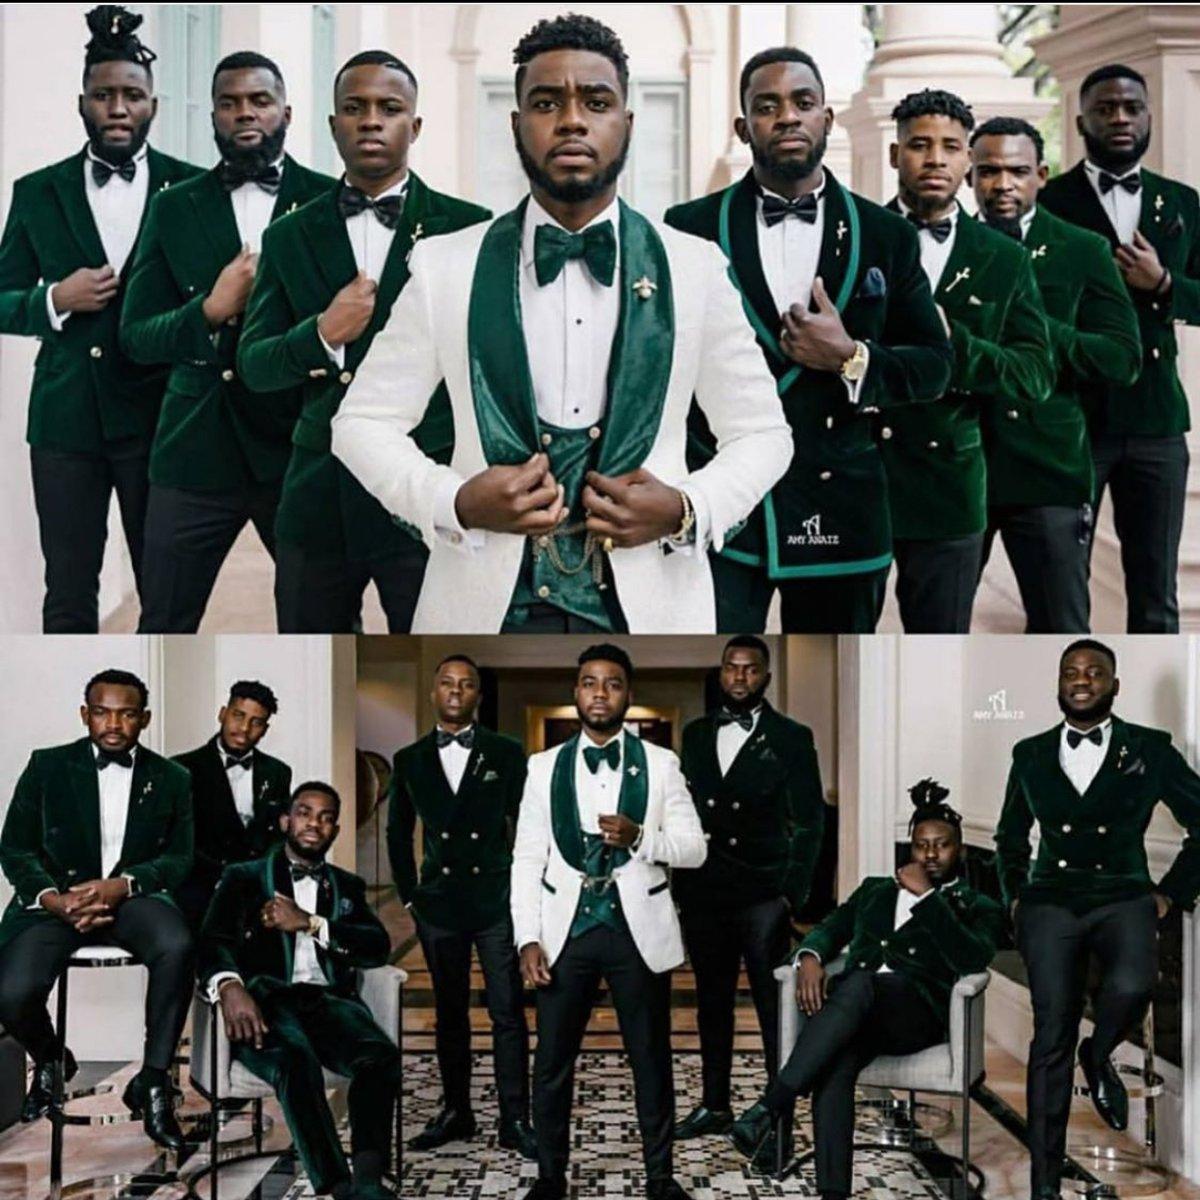 LUXE GROOMSMEN FEATURE:  Fb rp: GroomInspiration  . . . . #luxemen #luxewedding #weddingvibes #wedding #men #lifestyle #lafw #nyfw #media #fsfashion #fashion #mensuits #groomsmen #groompic.twitter.com/6UKZtexr9l